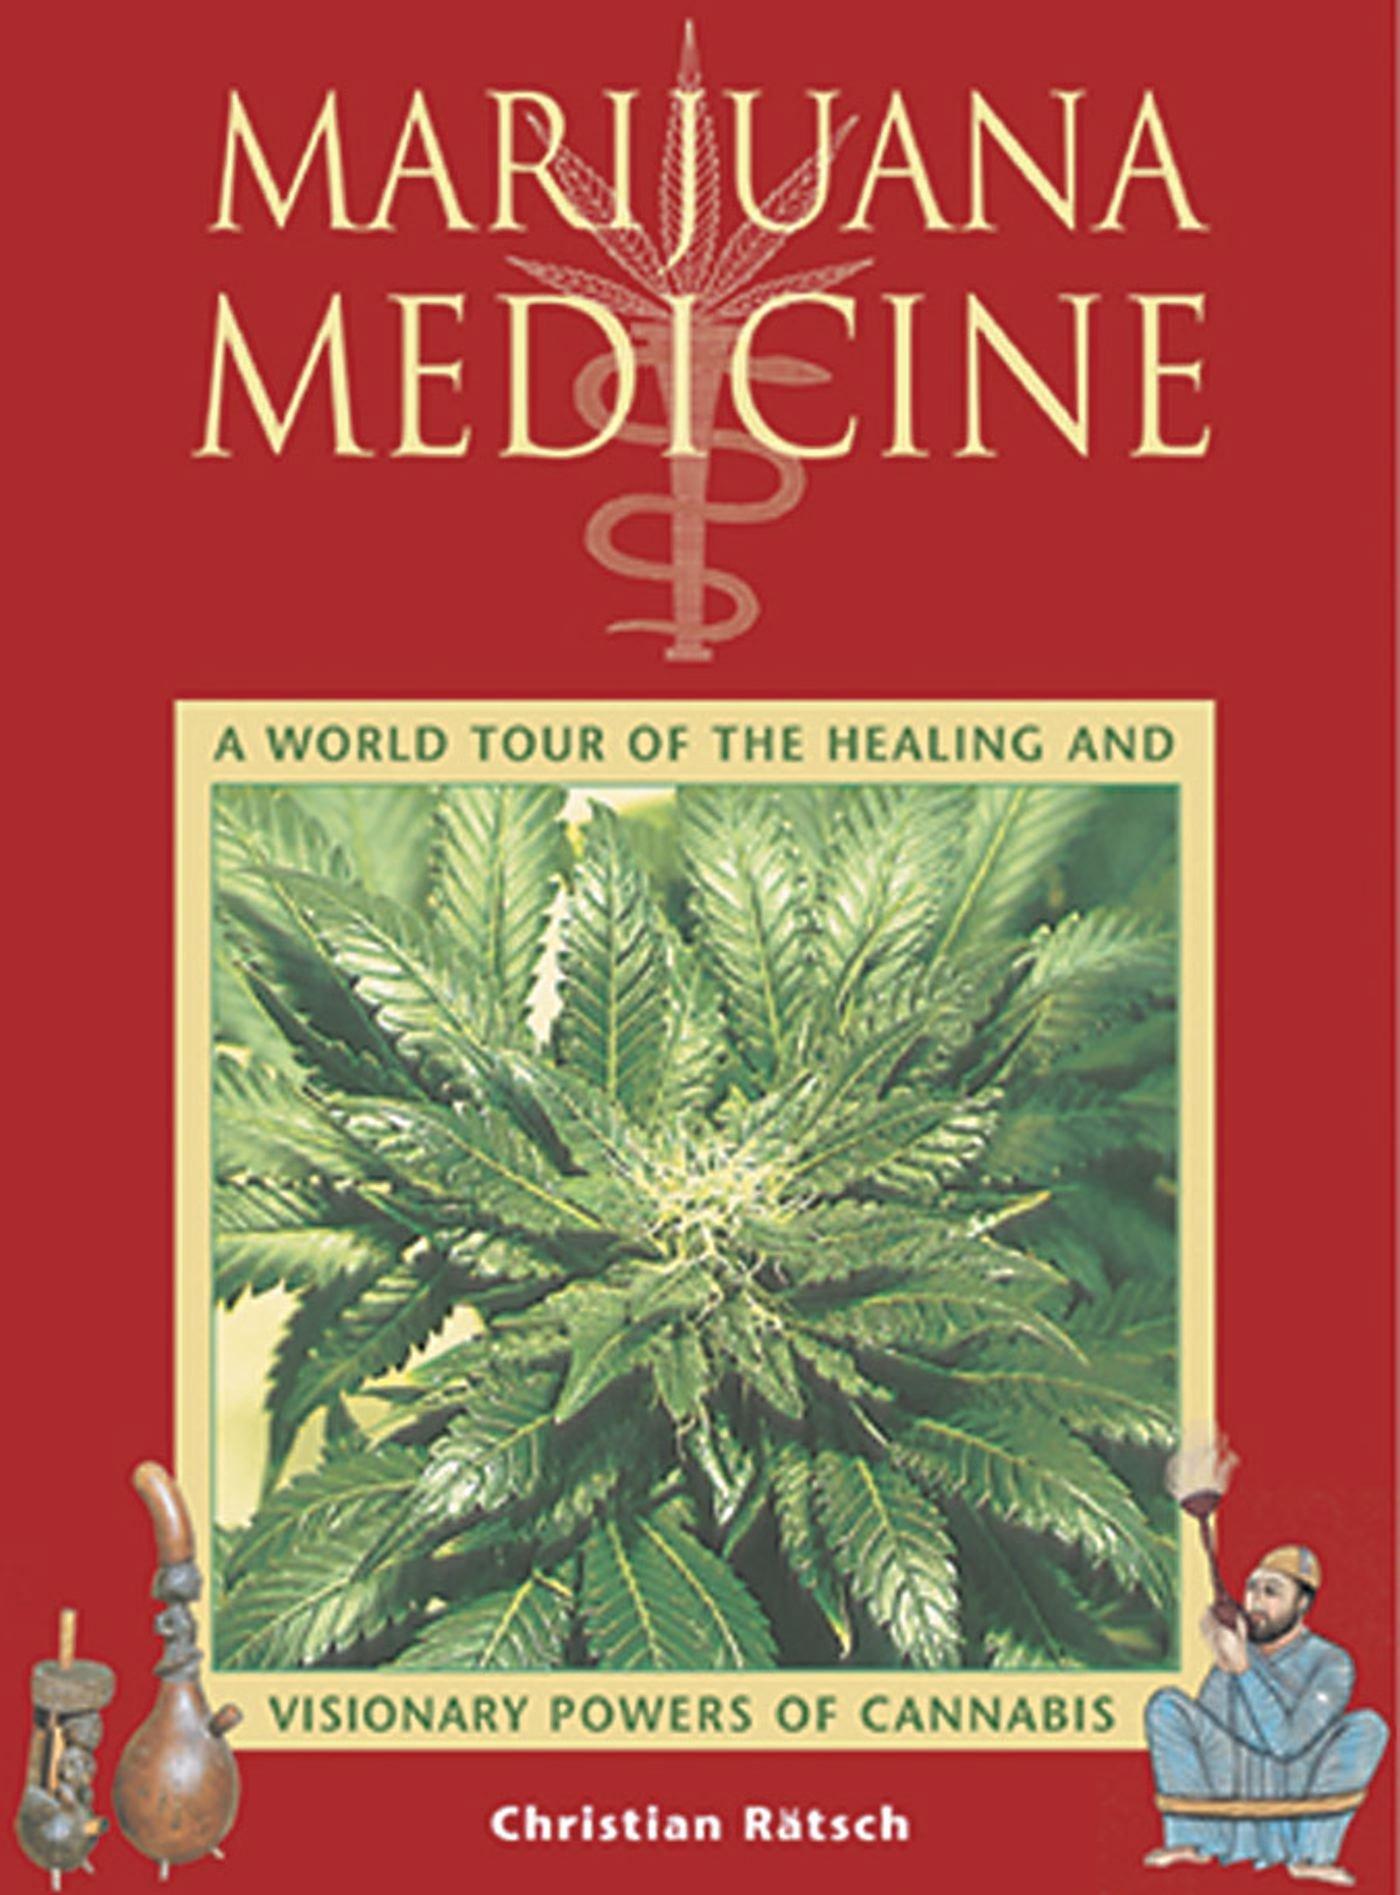 Marijuana Medicine: A World Tour of the Healing and Visionary Powers of Cannabis: Rätsch, Christian, Ratsch, Christian: 9780892819331: Amazon.com: Books